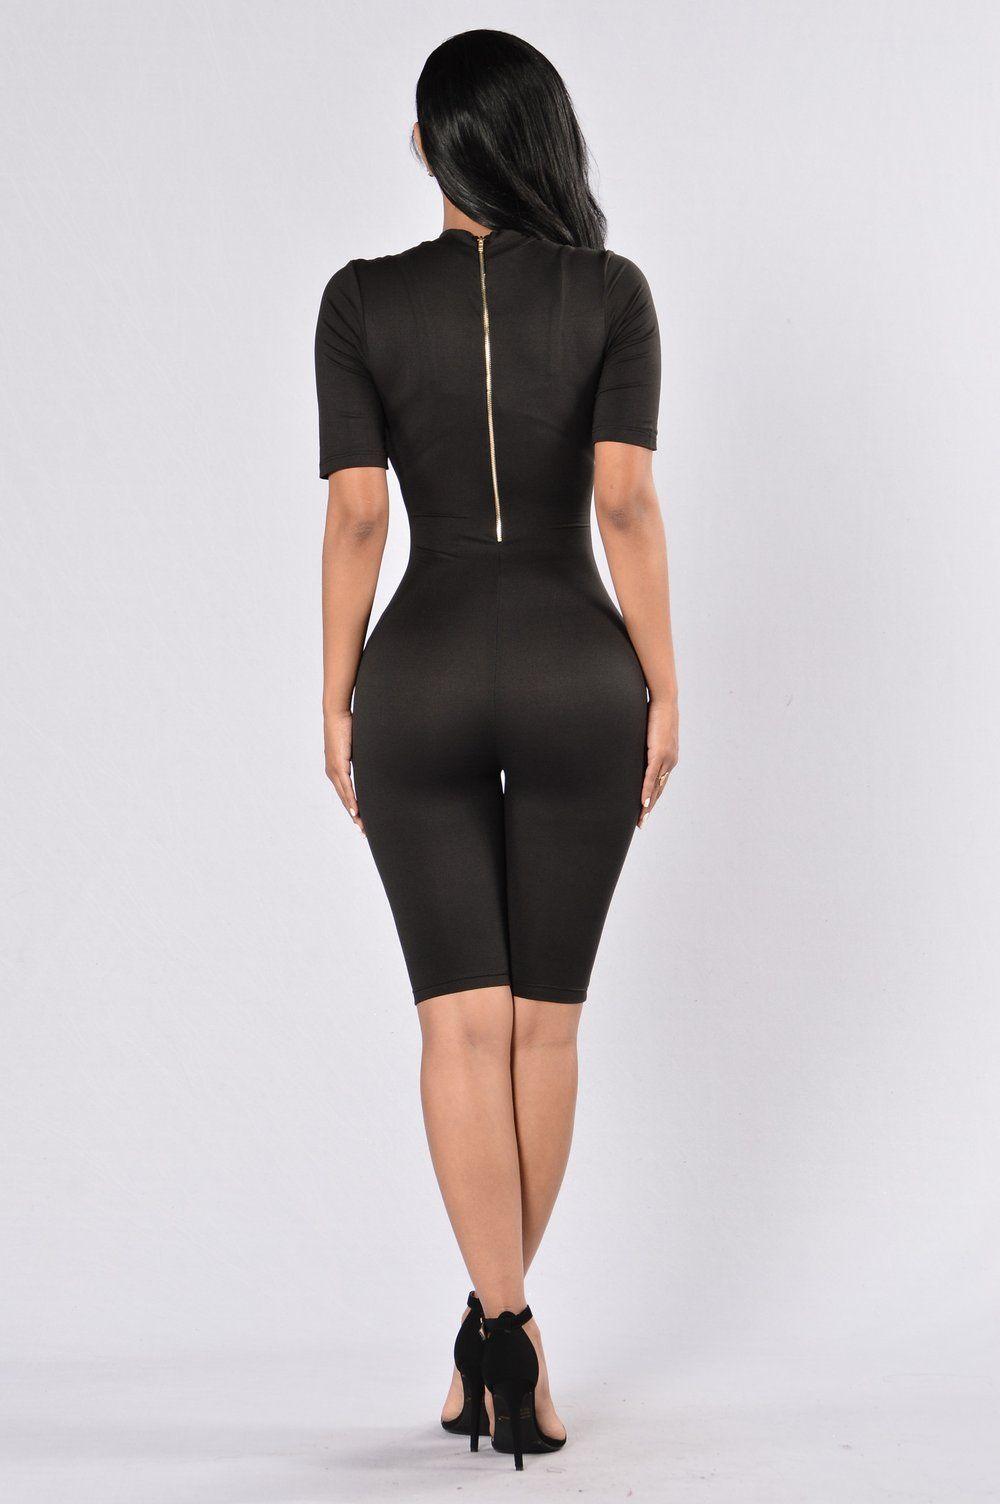 Waylay Jumpsuit - Black | sewing patterns | Pinterest